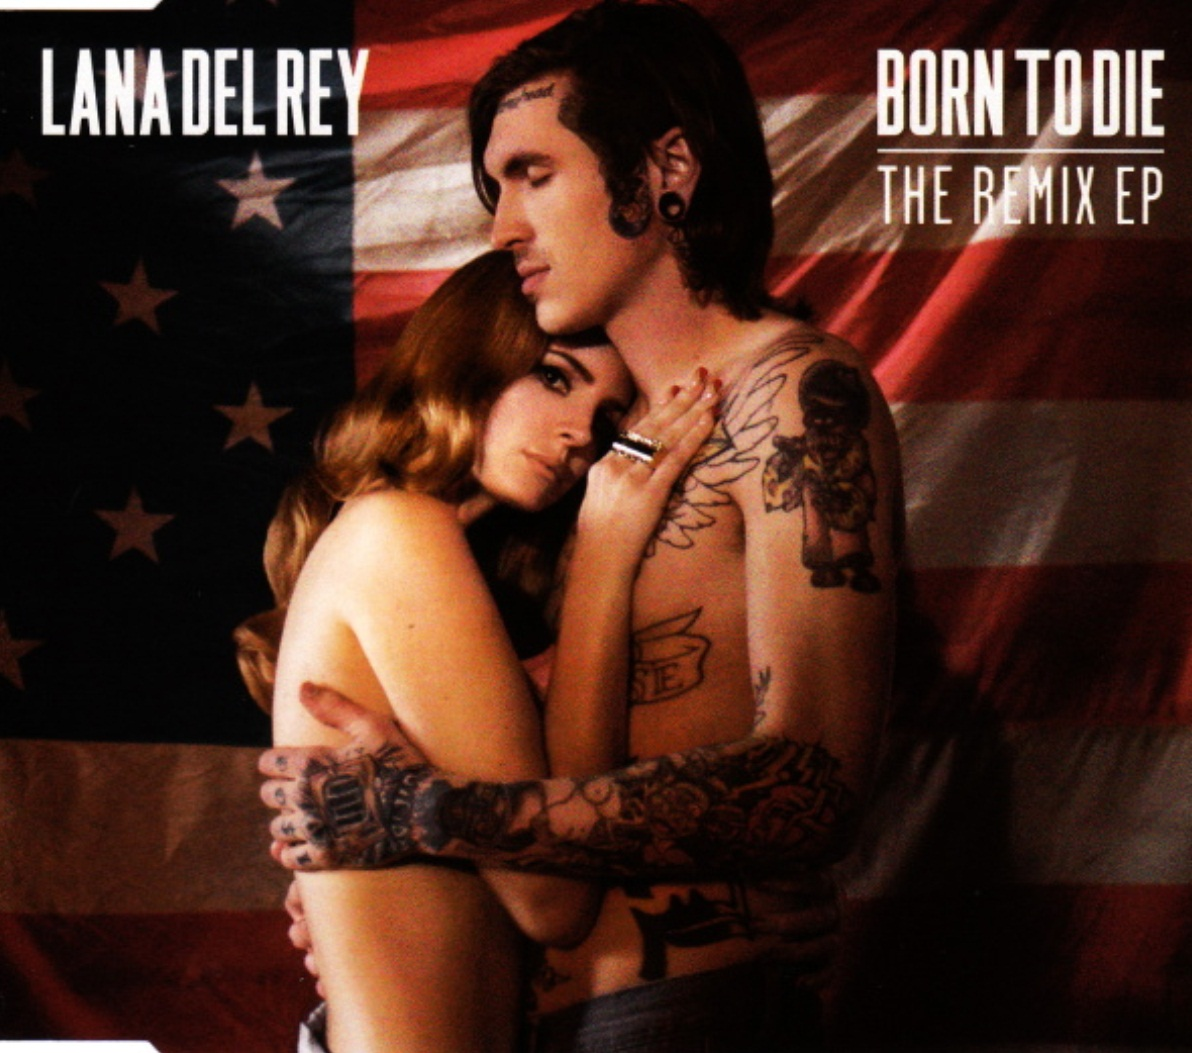 http://1.bp.blogspot.com/-eJAWcwOwrrU/UTObmOvgasI/AAAAAAAACI8/b1J3MS2yFvw/s1600/Lana+Del+Rey+-+Born+To+Die+(The+Remix+EP)+-+Front.jpg